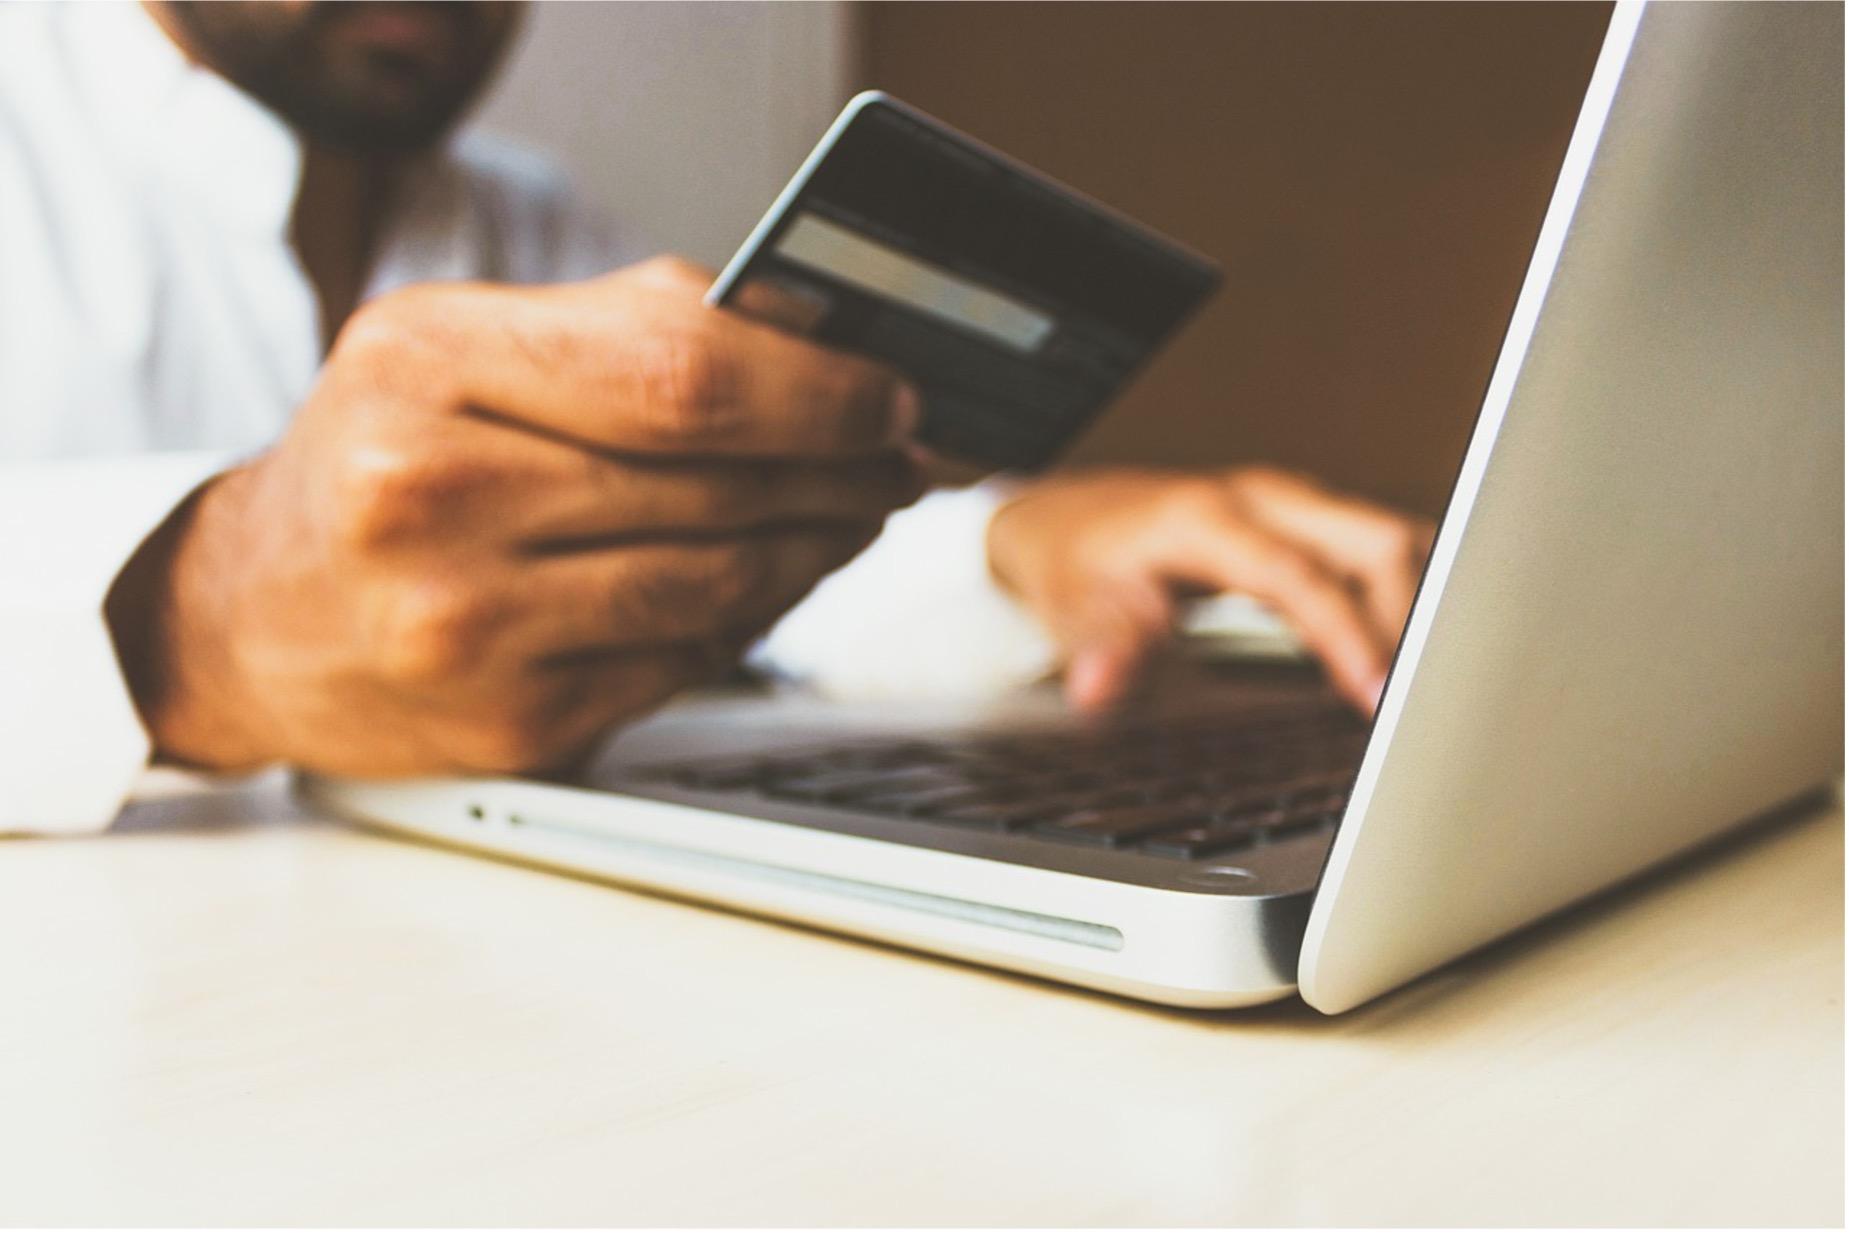 Pankkikortilla maksaminen